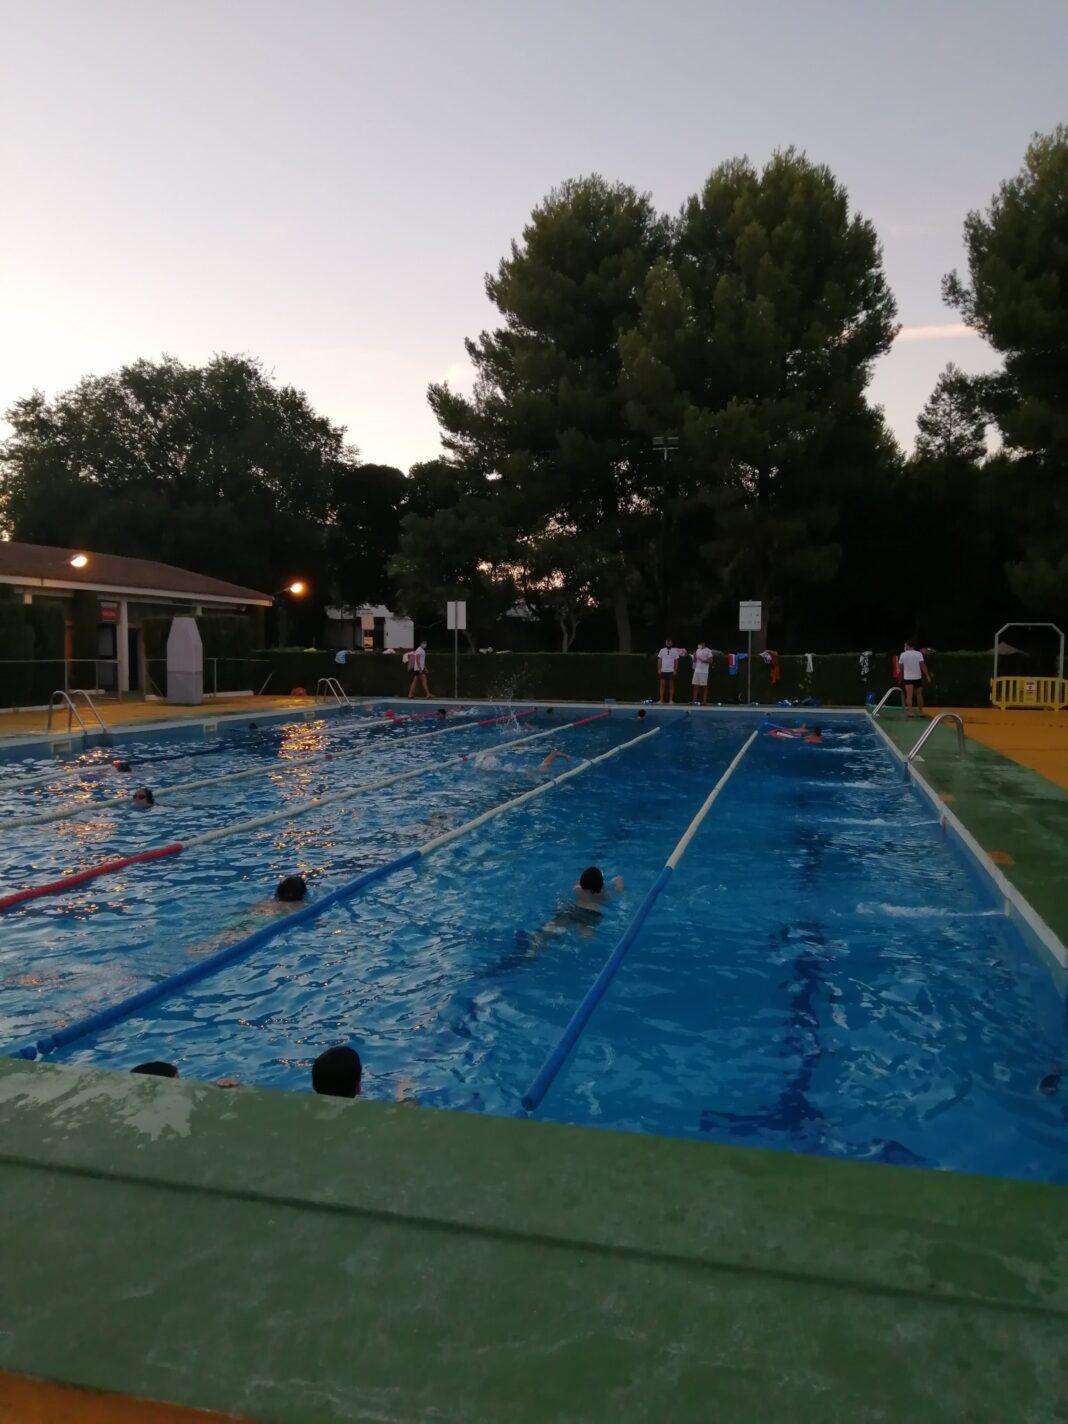 comienzo cursillos natacion covid 19 herencia 1068x1424 - Comienzo de los cursillos de natación de agosto en Herencia